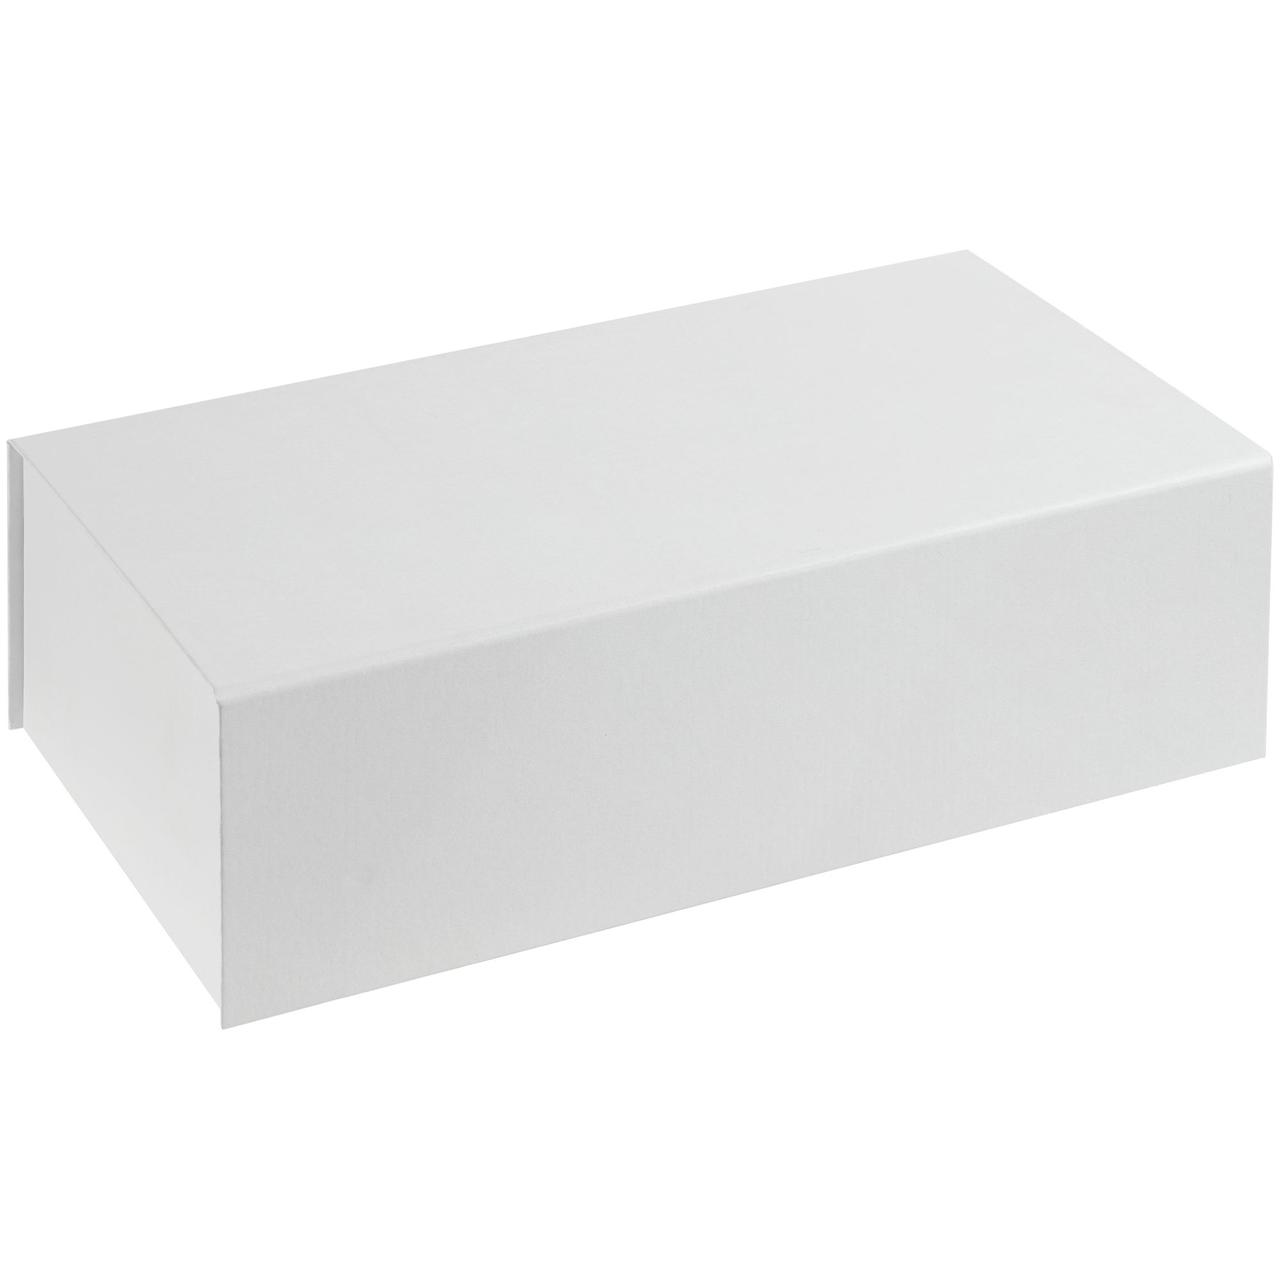 Коробка Store Core, белая (артикул 12430.60)